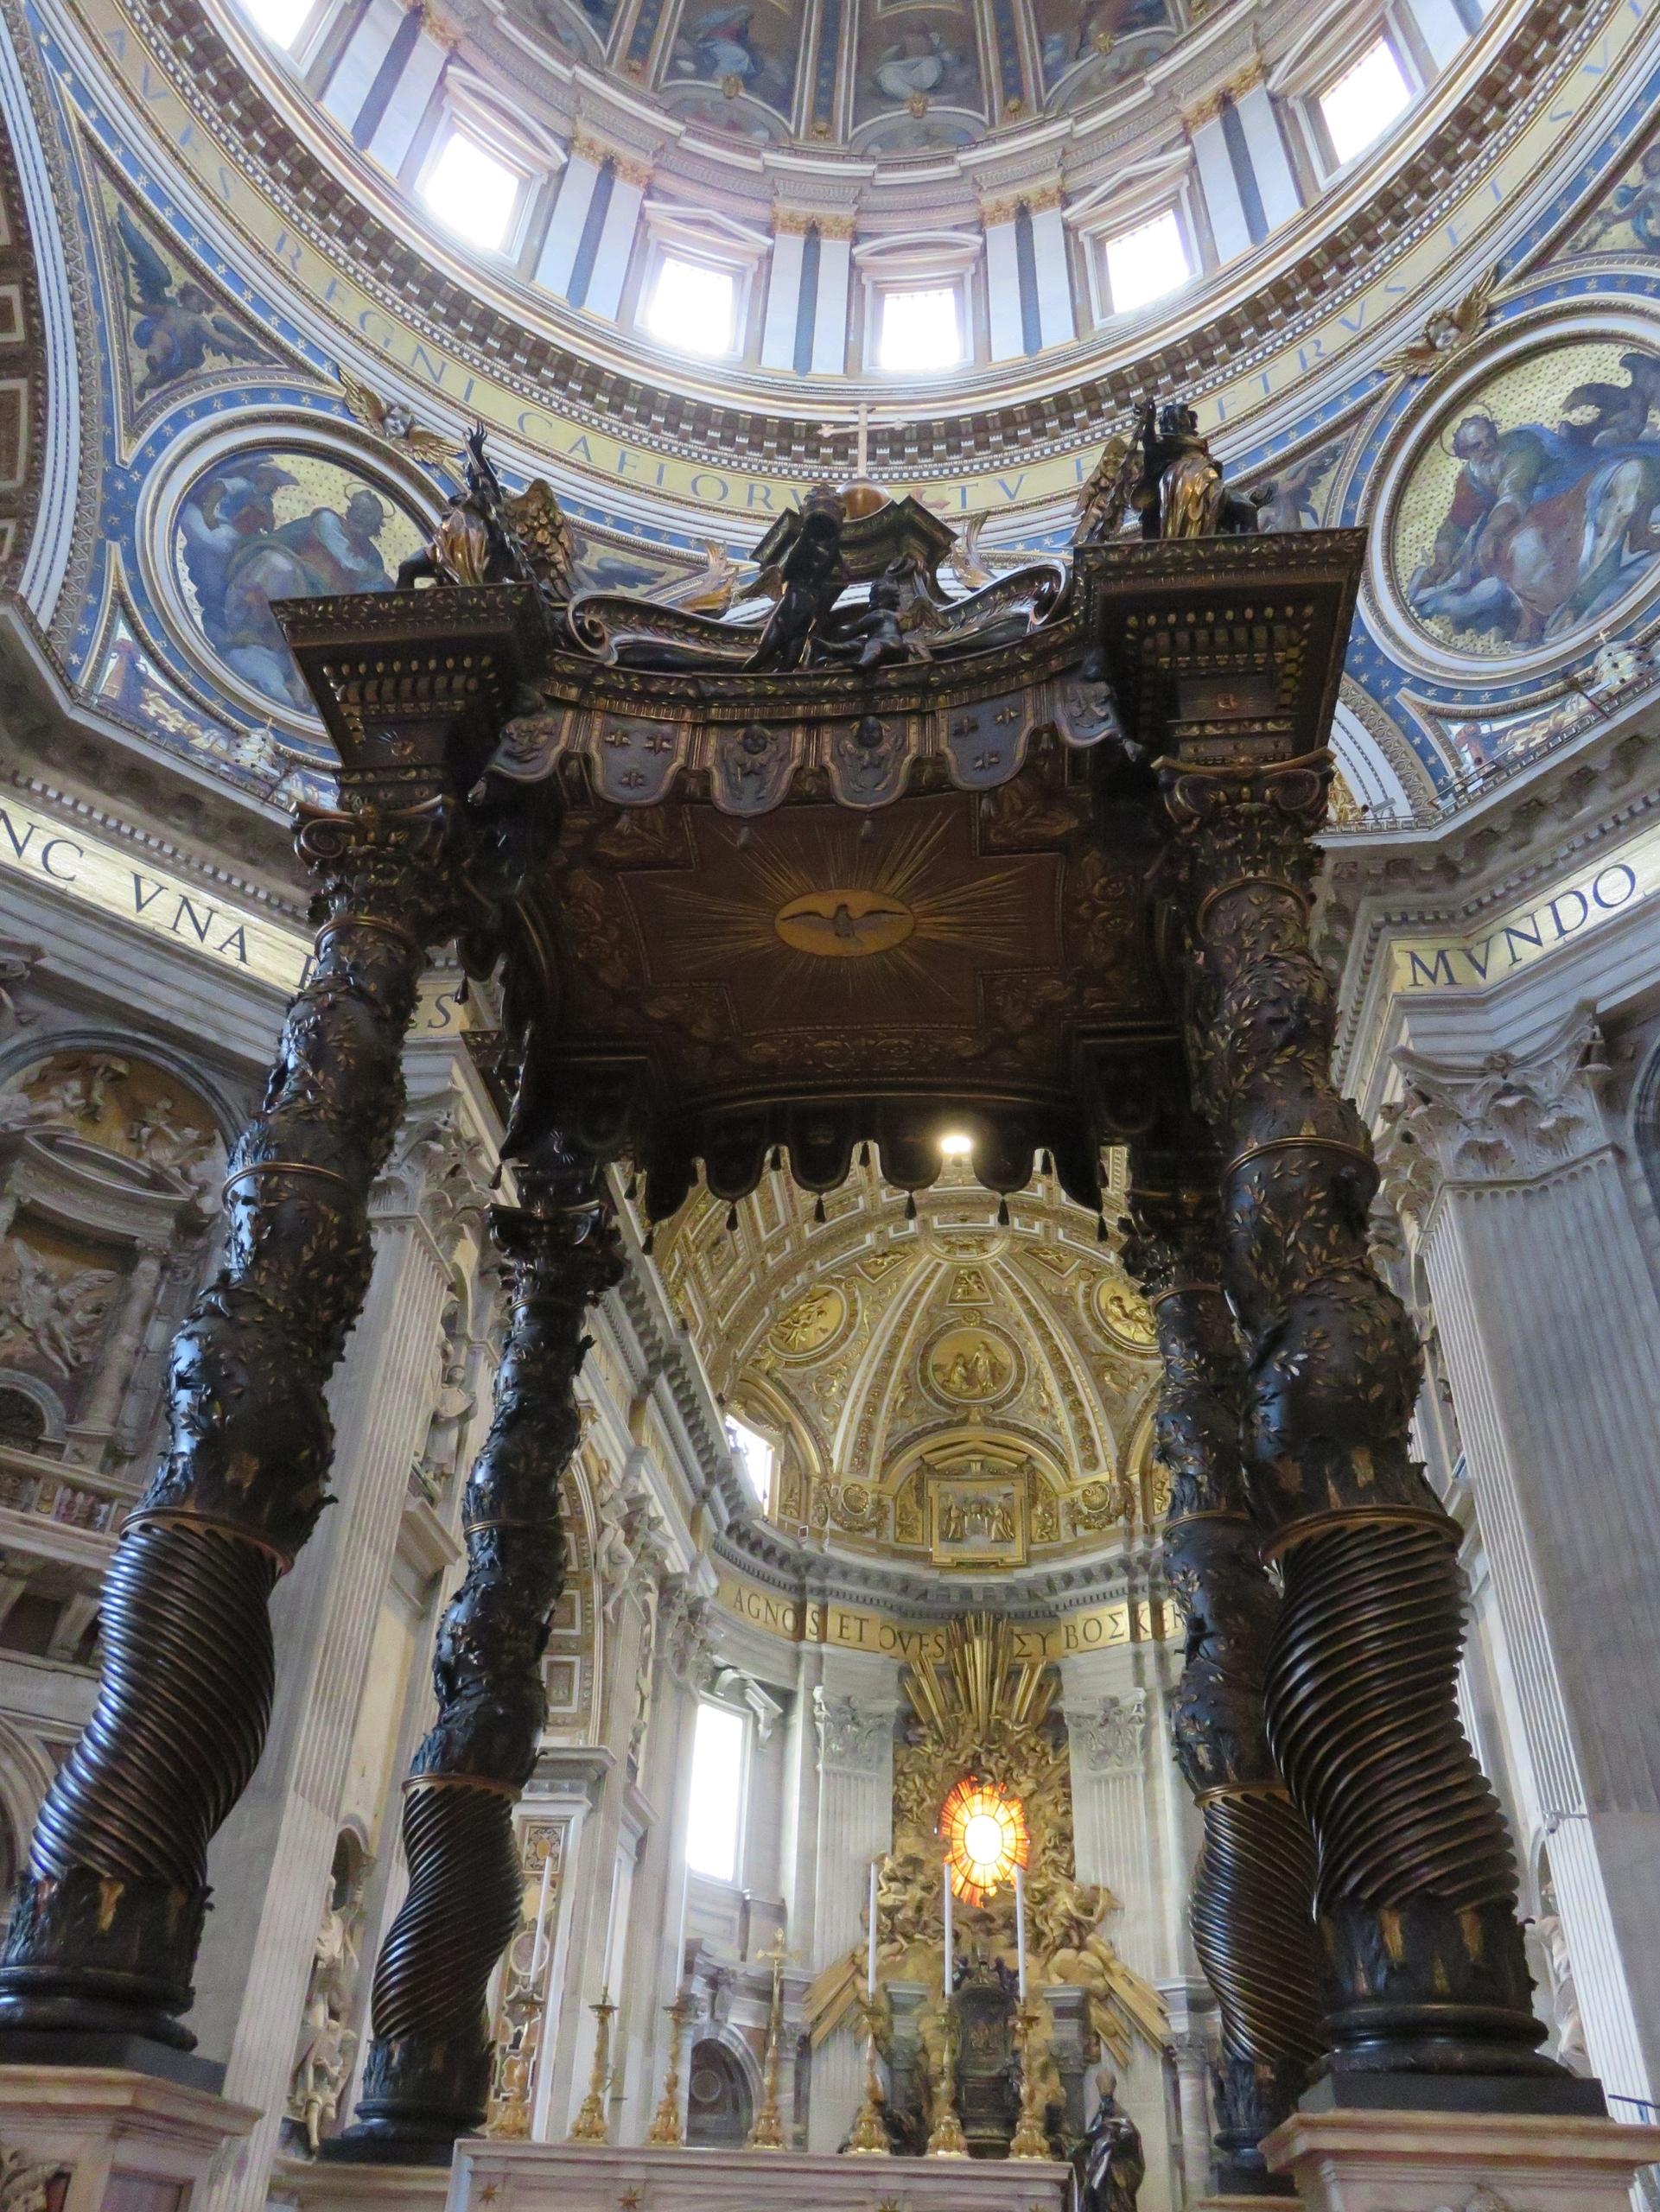 StPetersBasilica, Vatican, Catholic - sanftekuss | ello